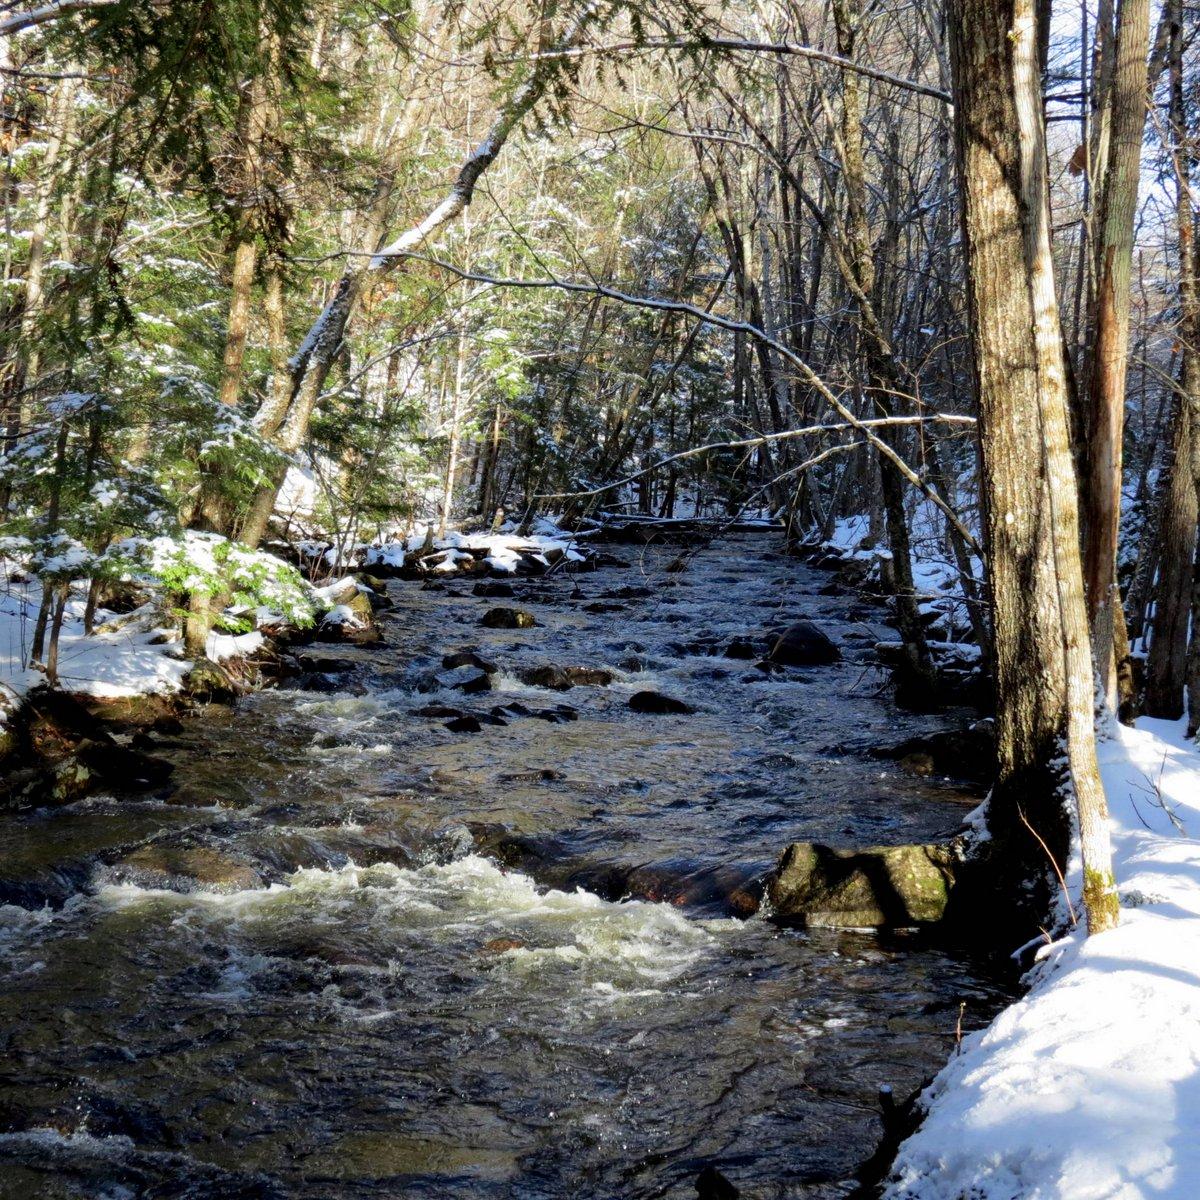 8. Beaver Brook